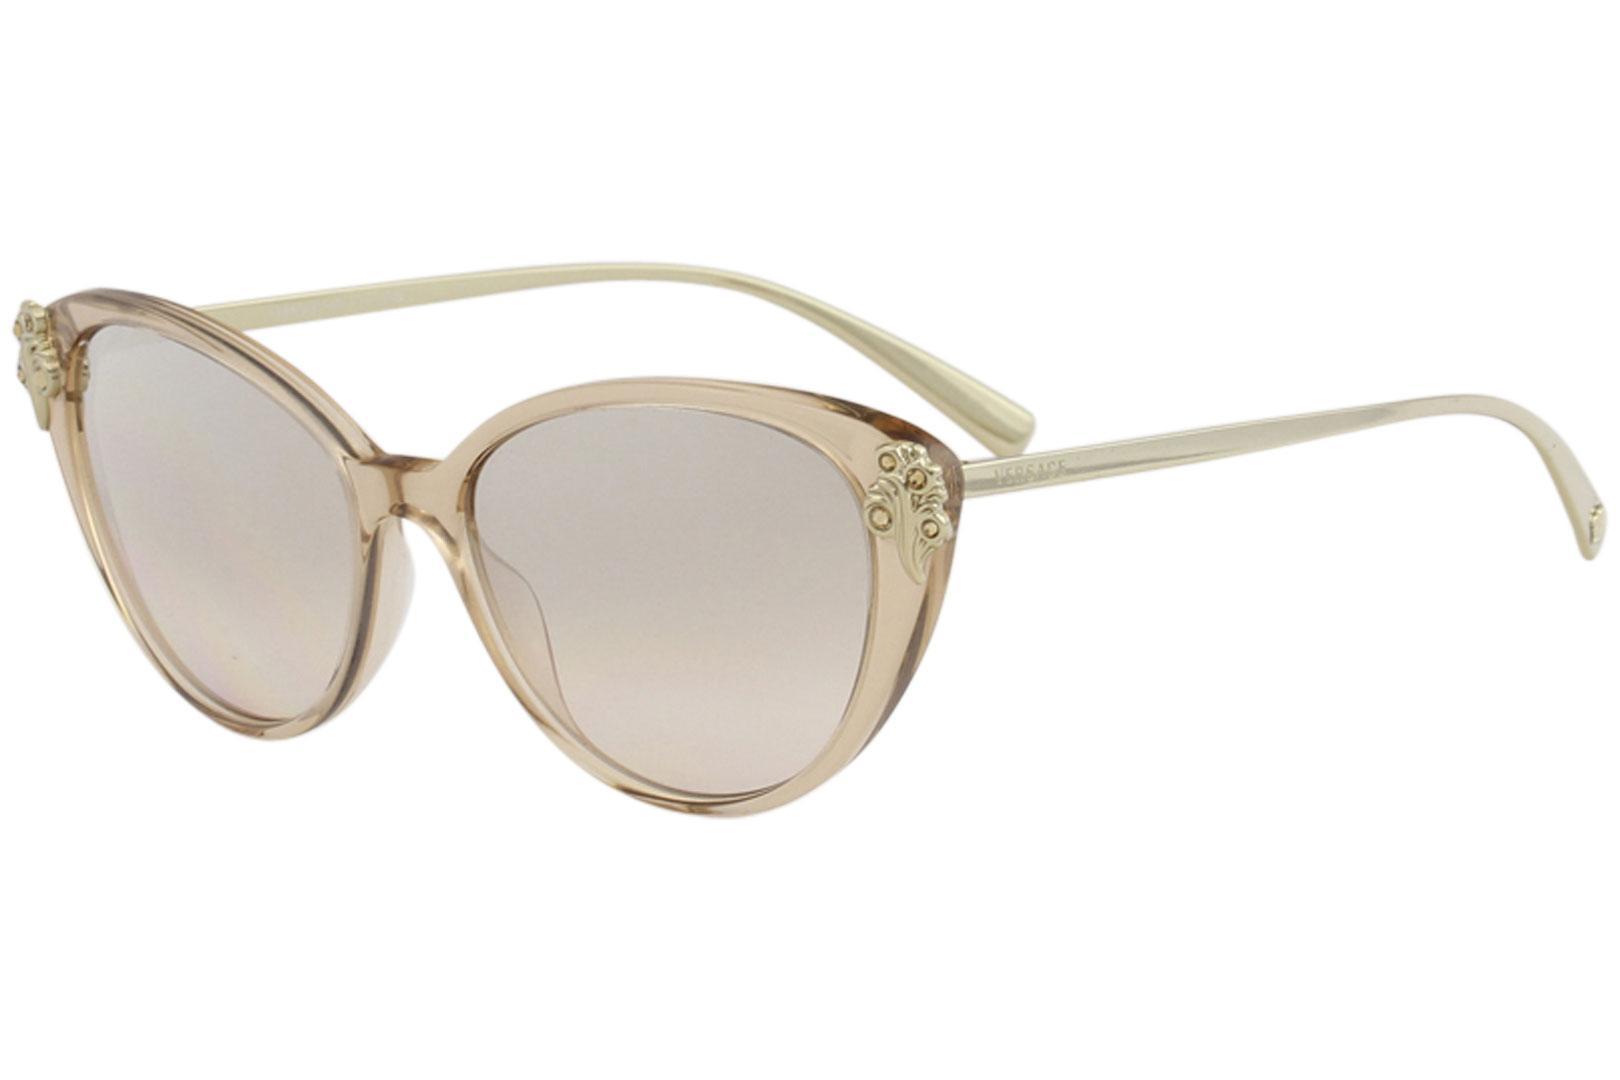 bd5a2b488c Versace Women s VE4351B VE 4351 B Fashion Cat Eye Sunglasses